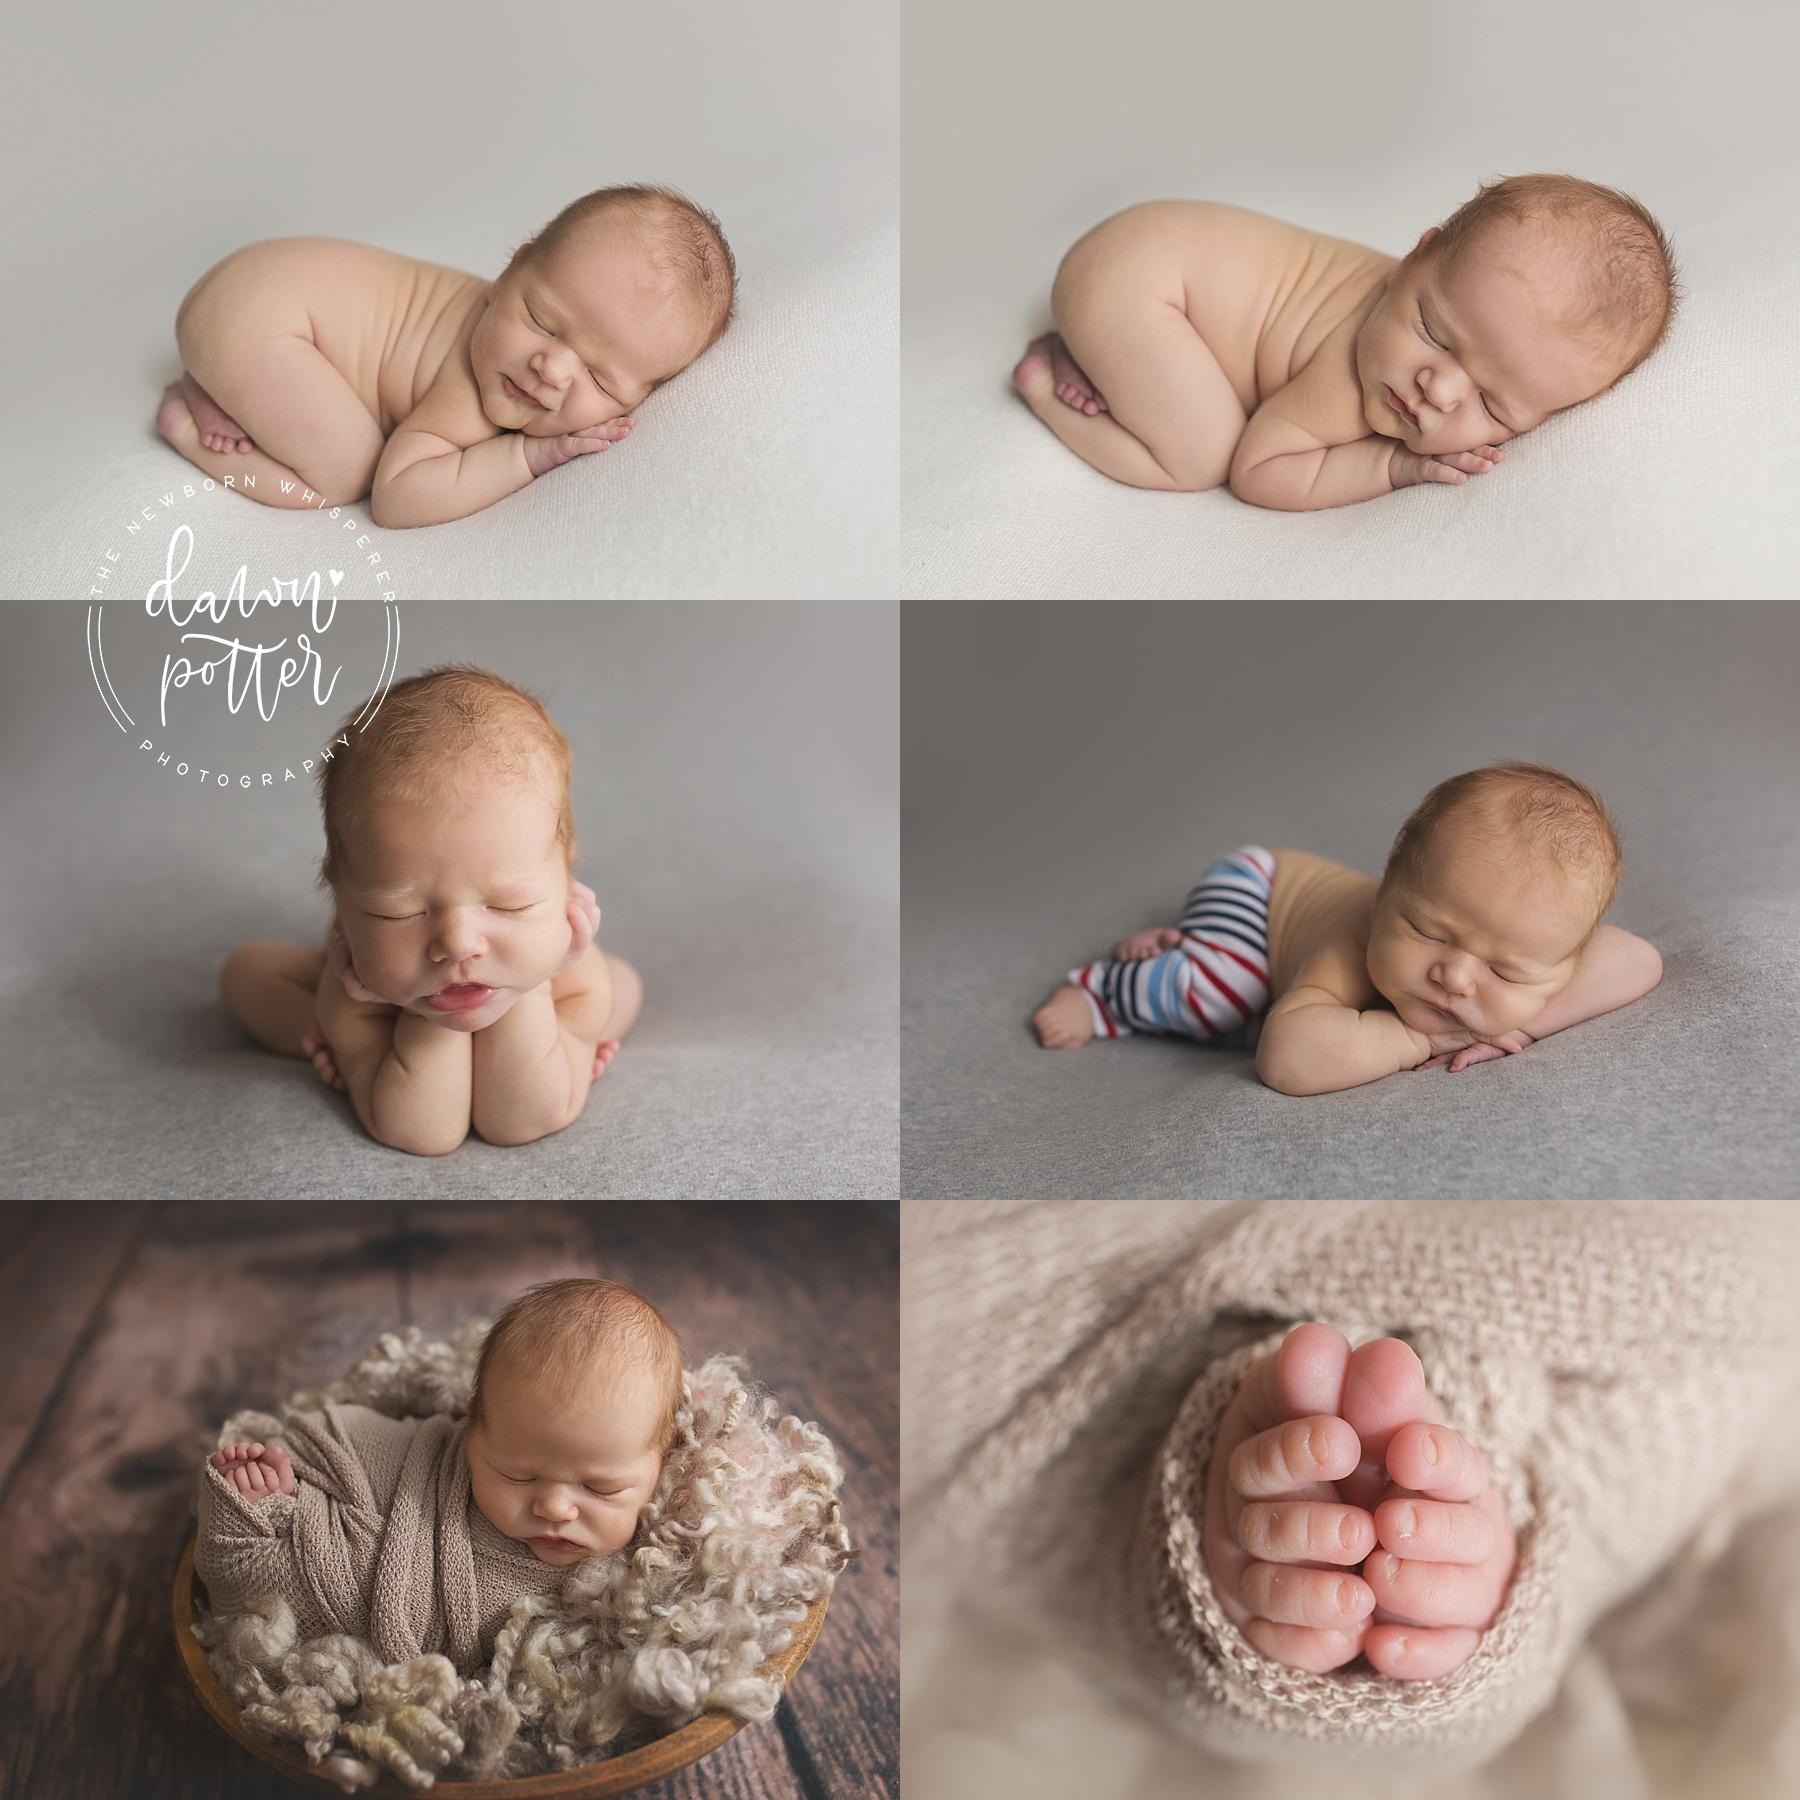 Bellevue Newborn Photography | Dawn Potter Photography